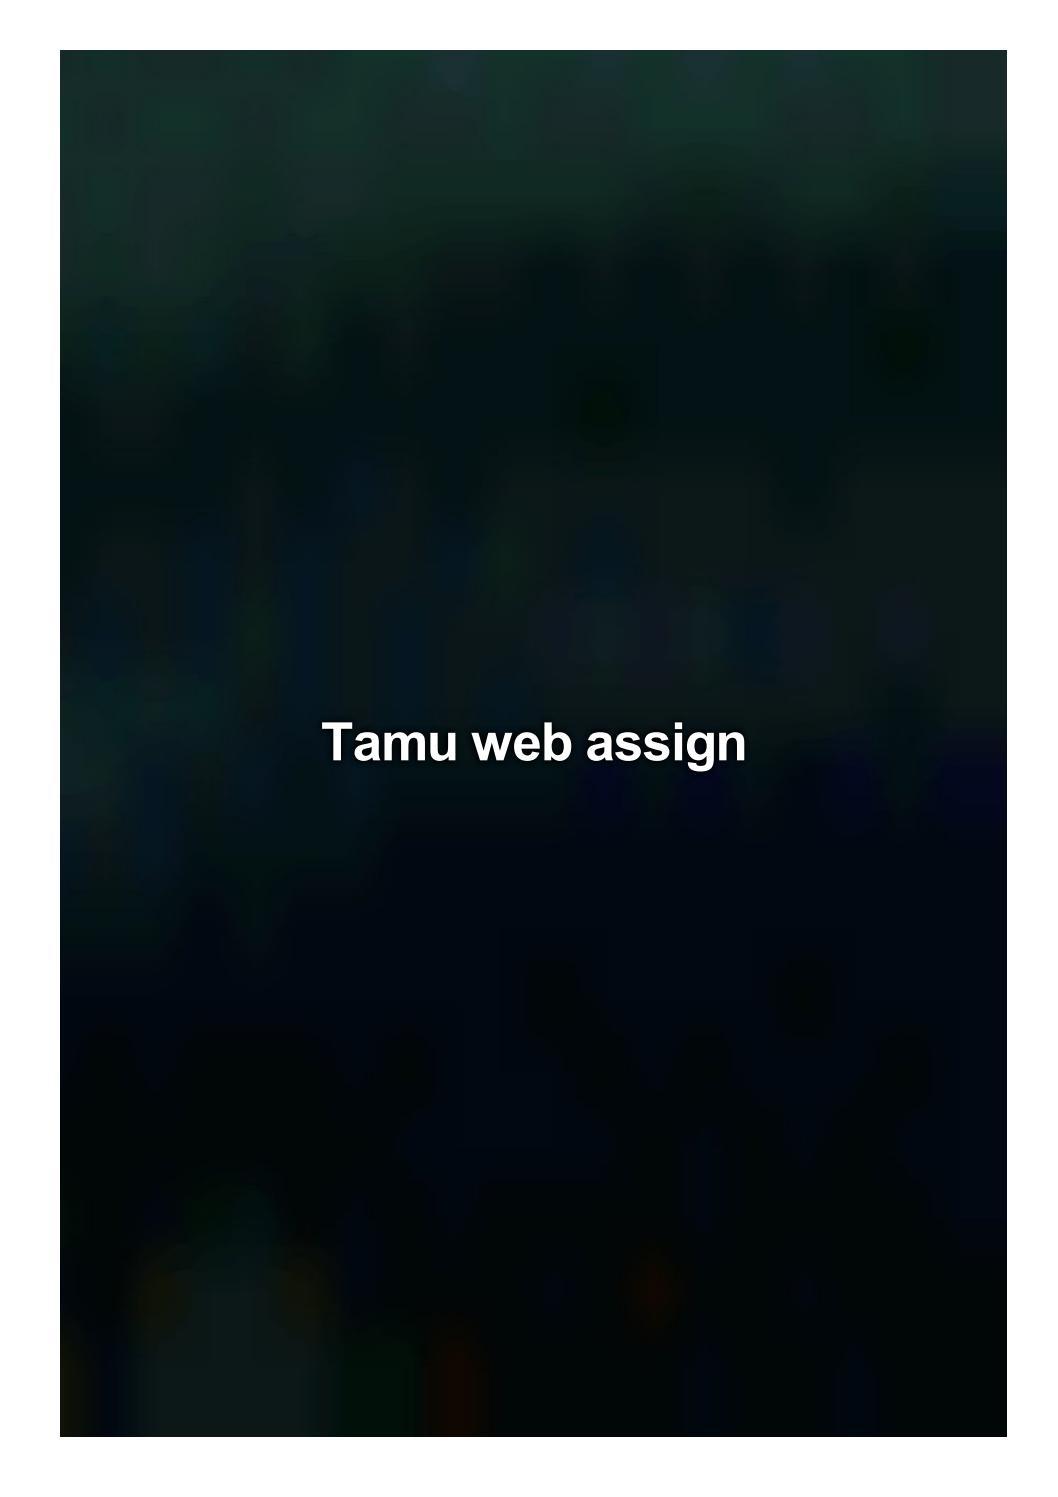 tamu webassign